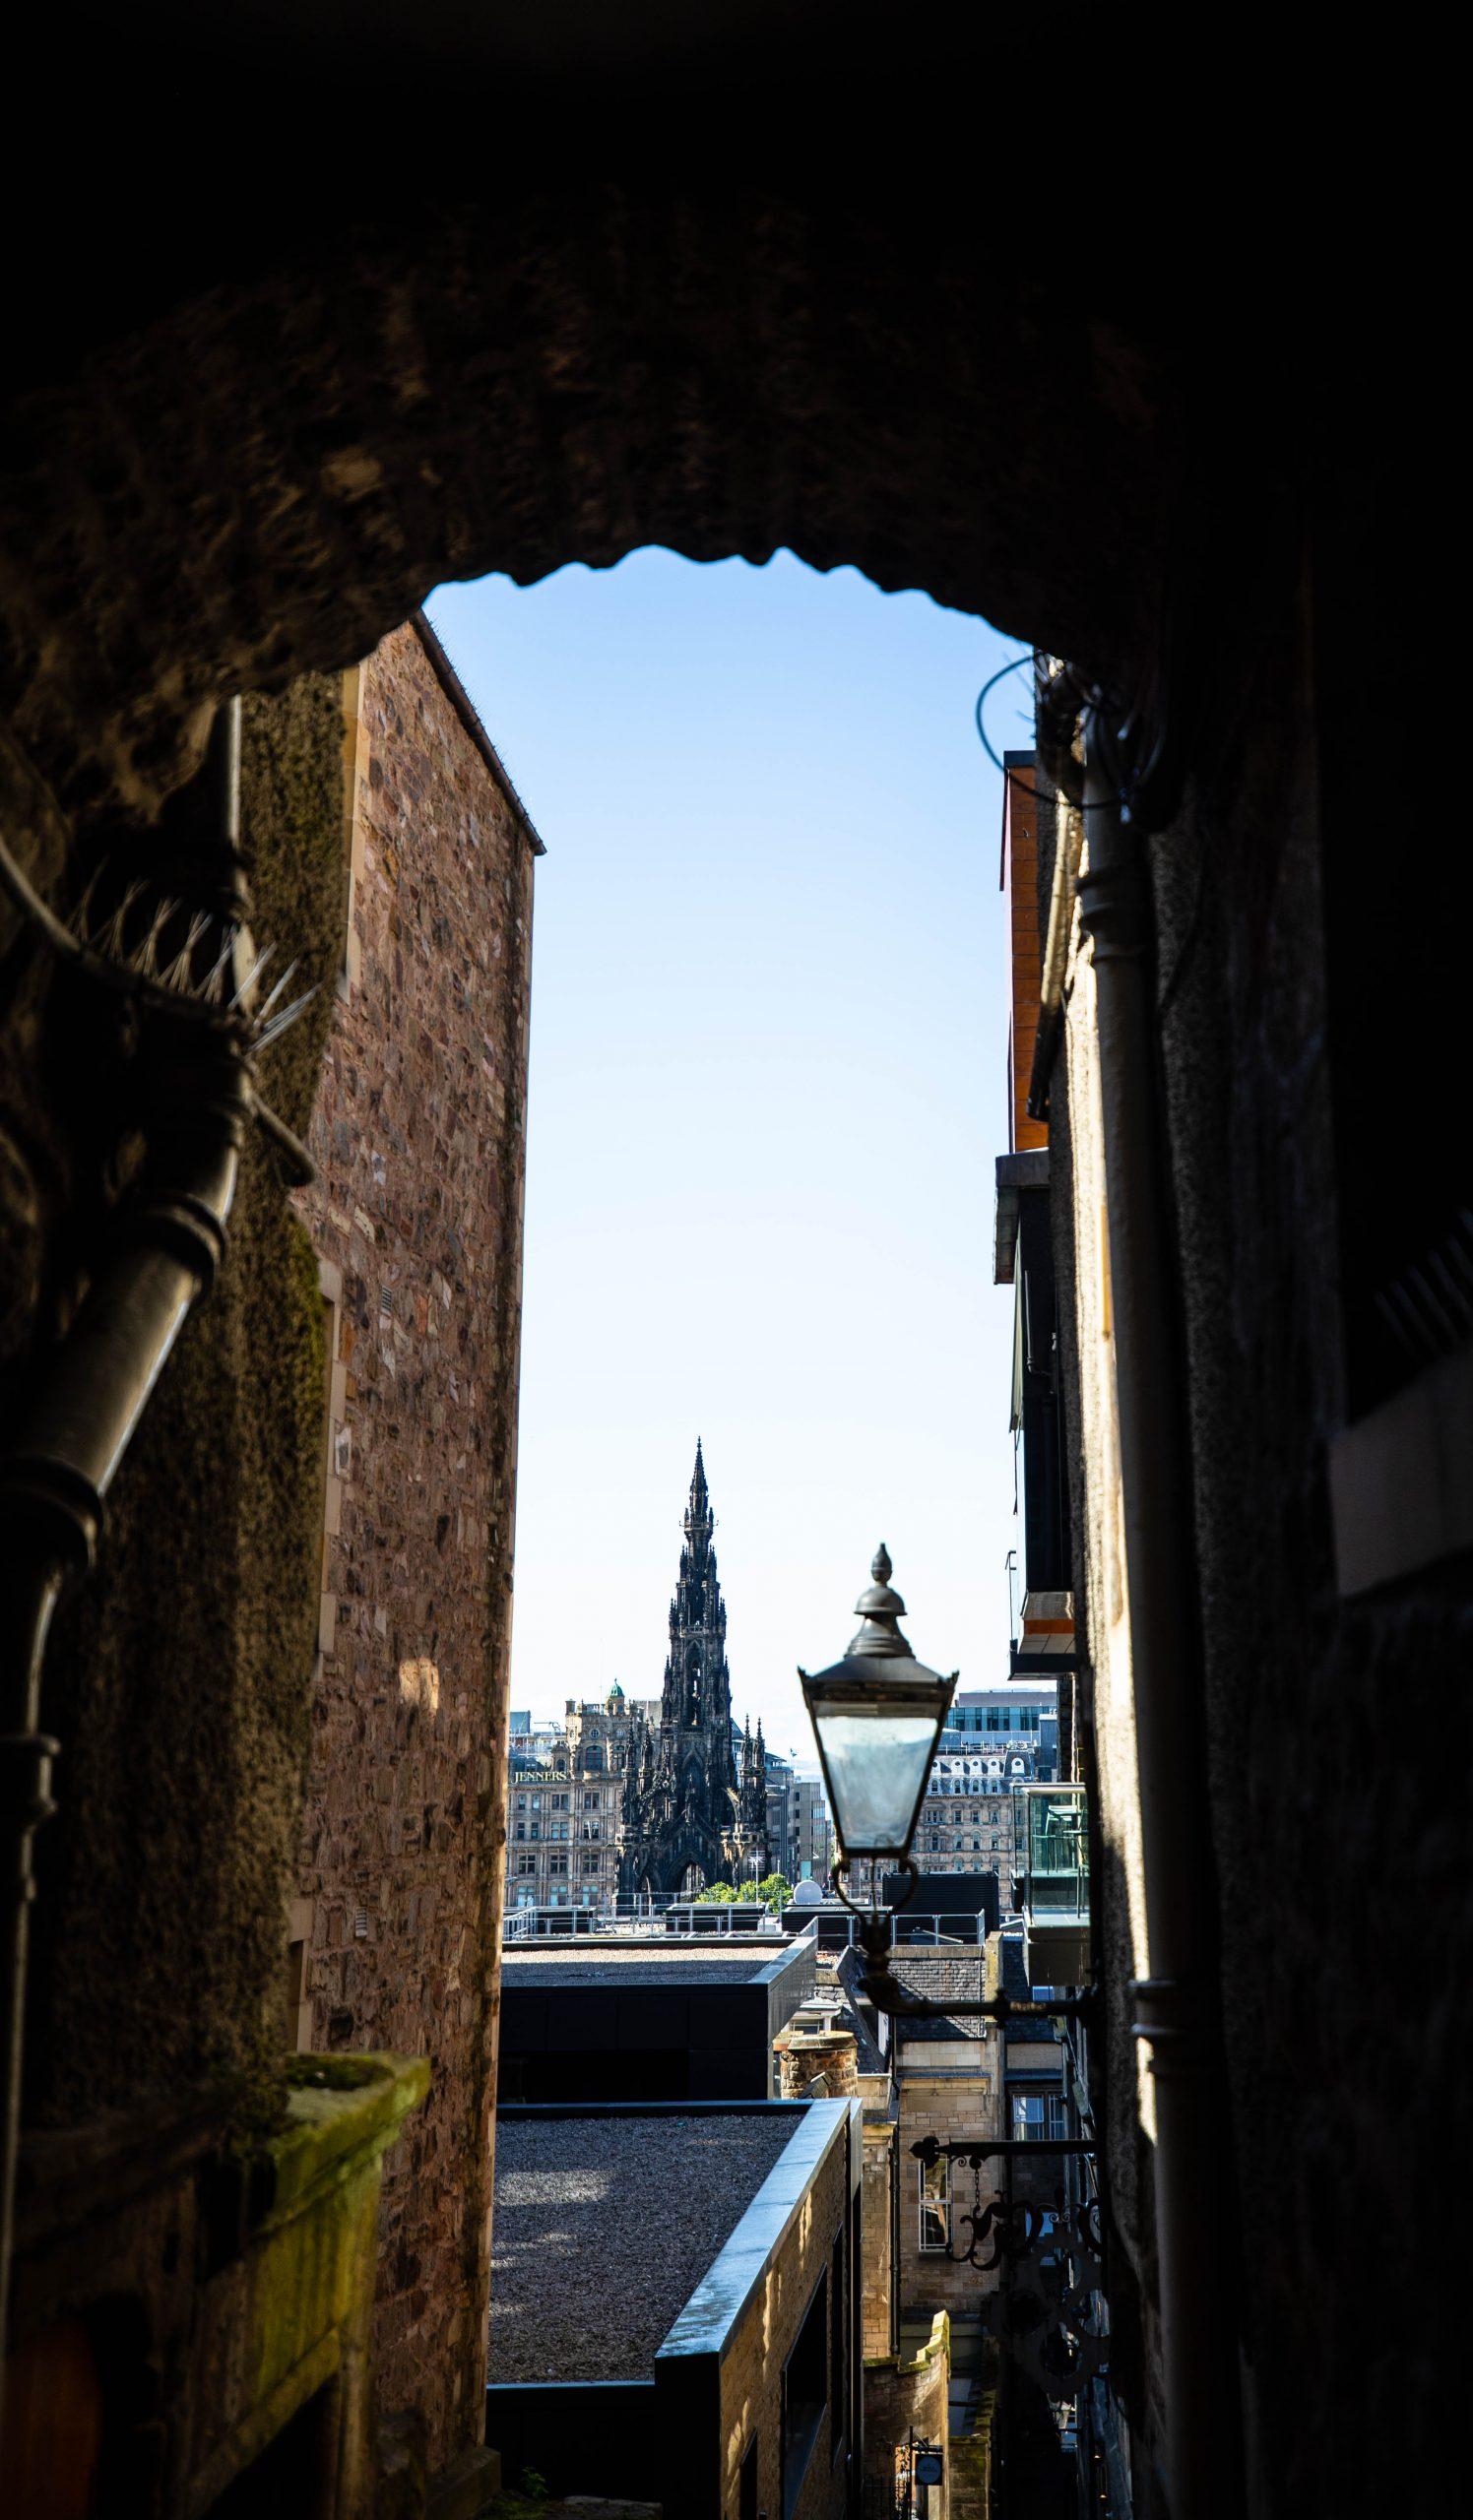 Craig's Close in Edinburgh, Scotland Old Town Luxury Travel Guide by Annie Fairfax incredible European Architecture